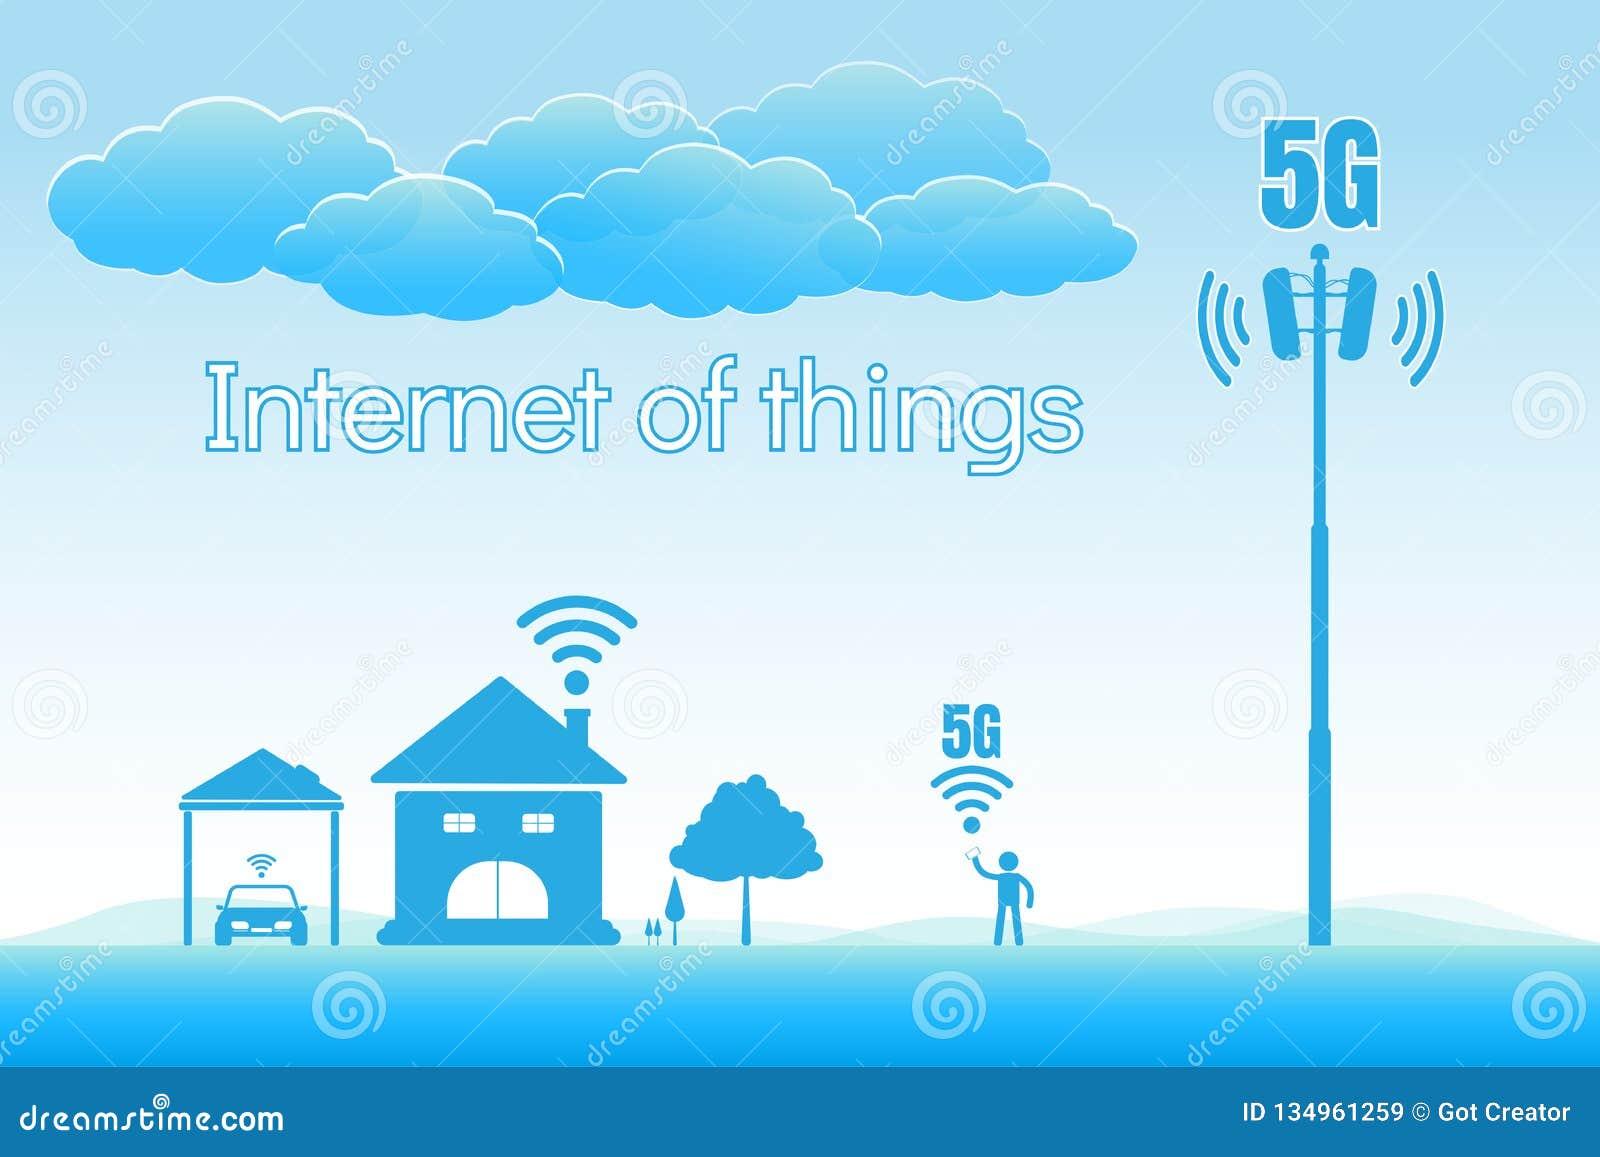 5G έννοια υψηλής ταχύτητας Διαδικτύου, Διαδίκτυο των πραγμάτων